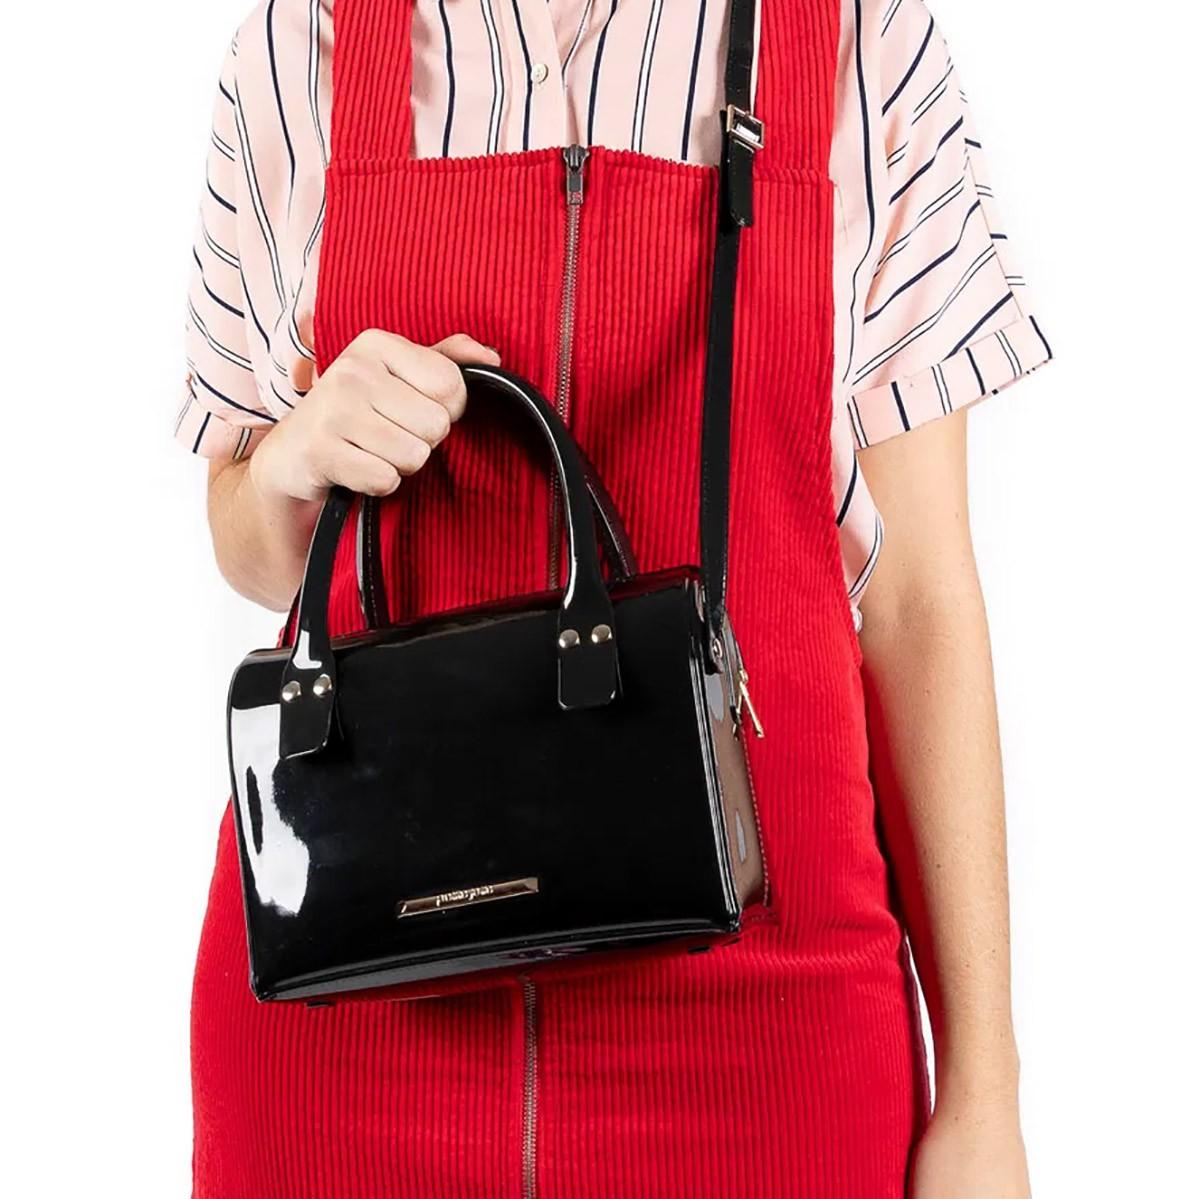 Bolsa Petite Jolie PJ6012 Lana